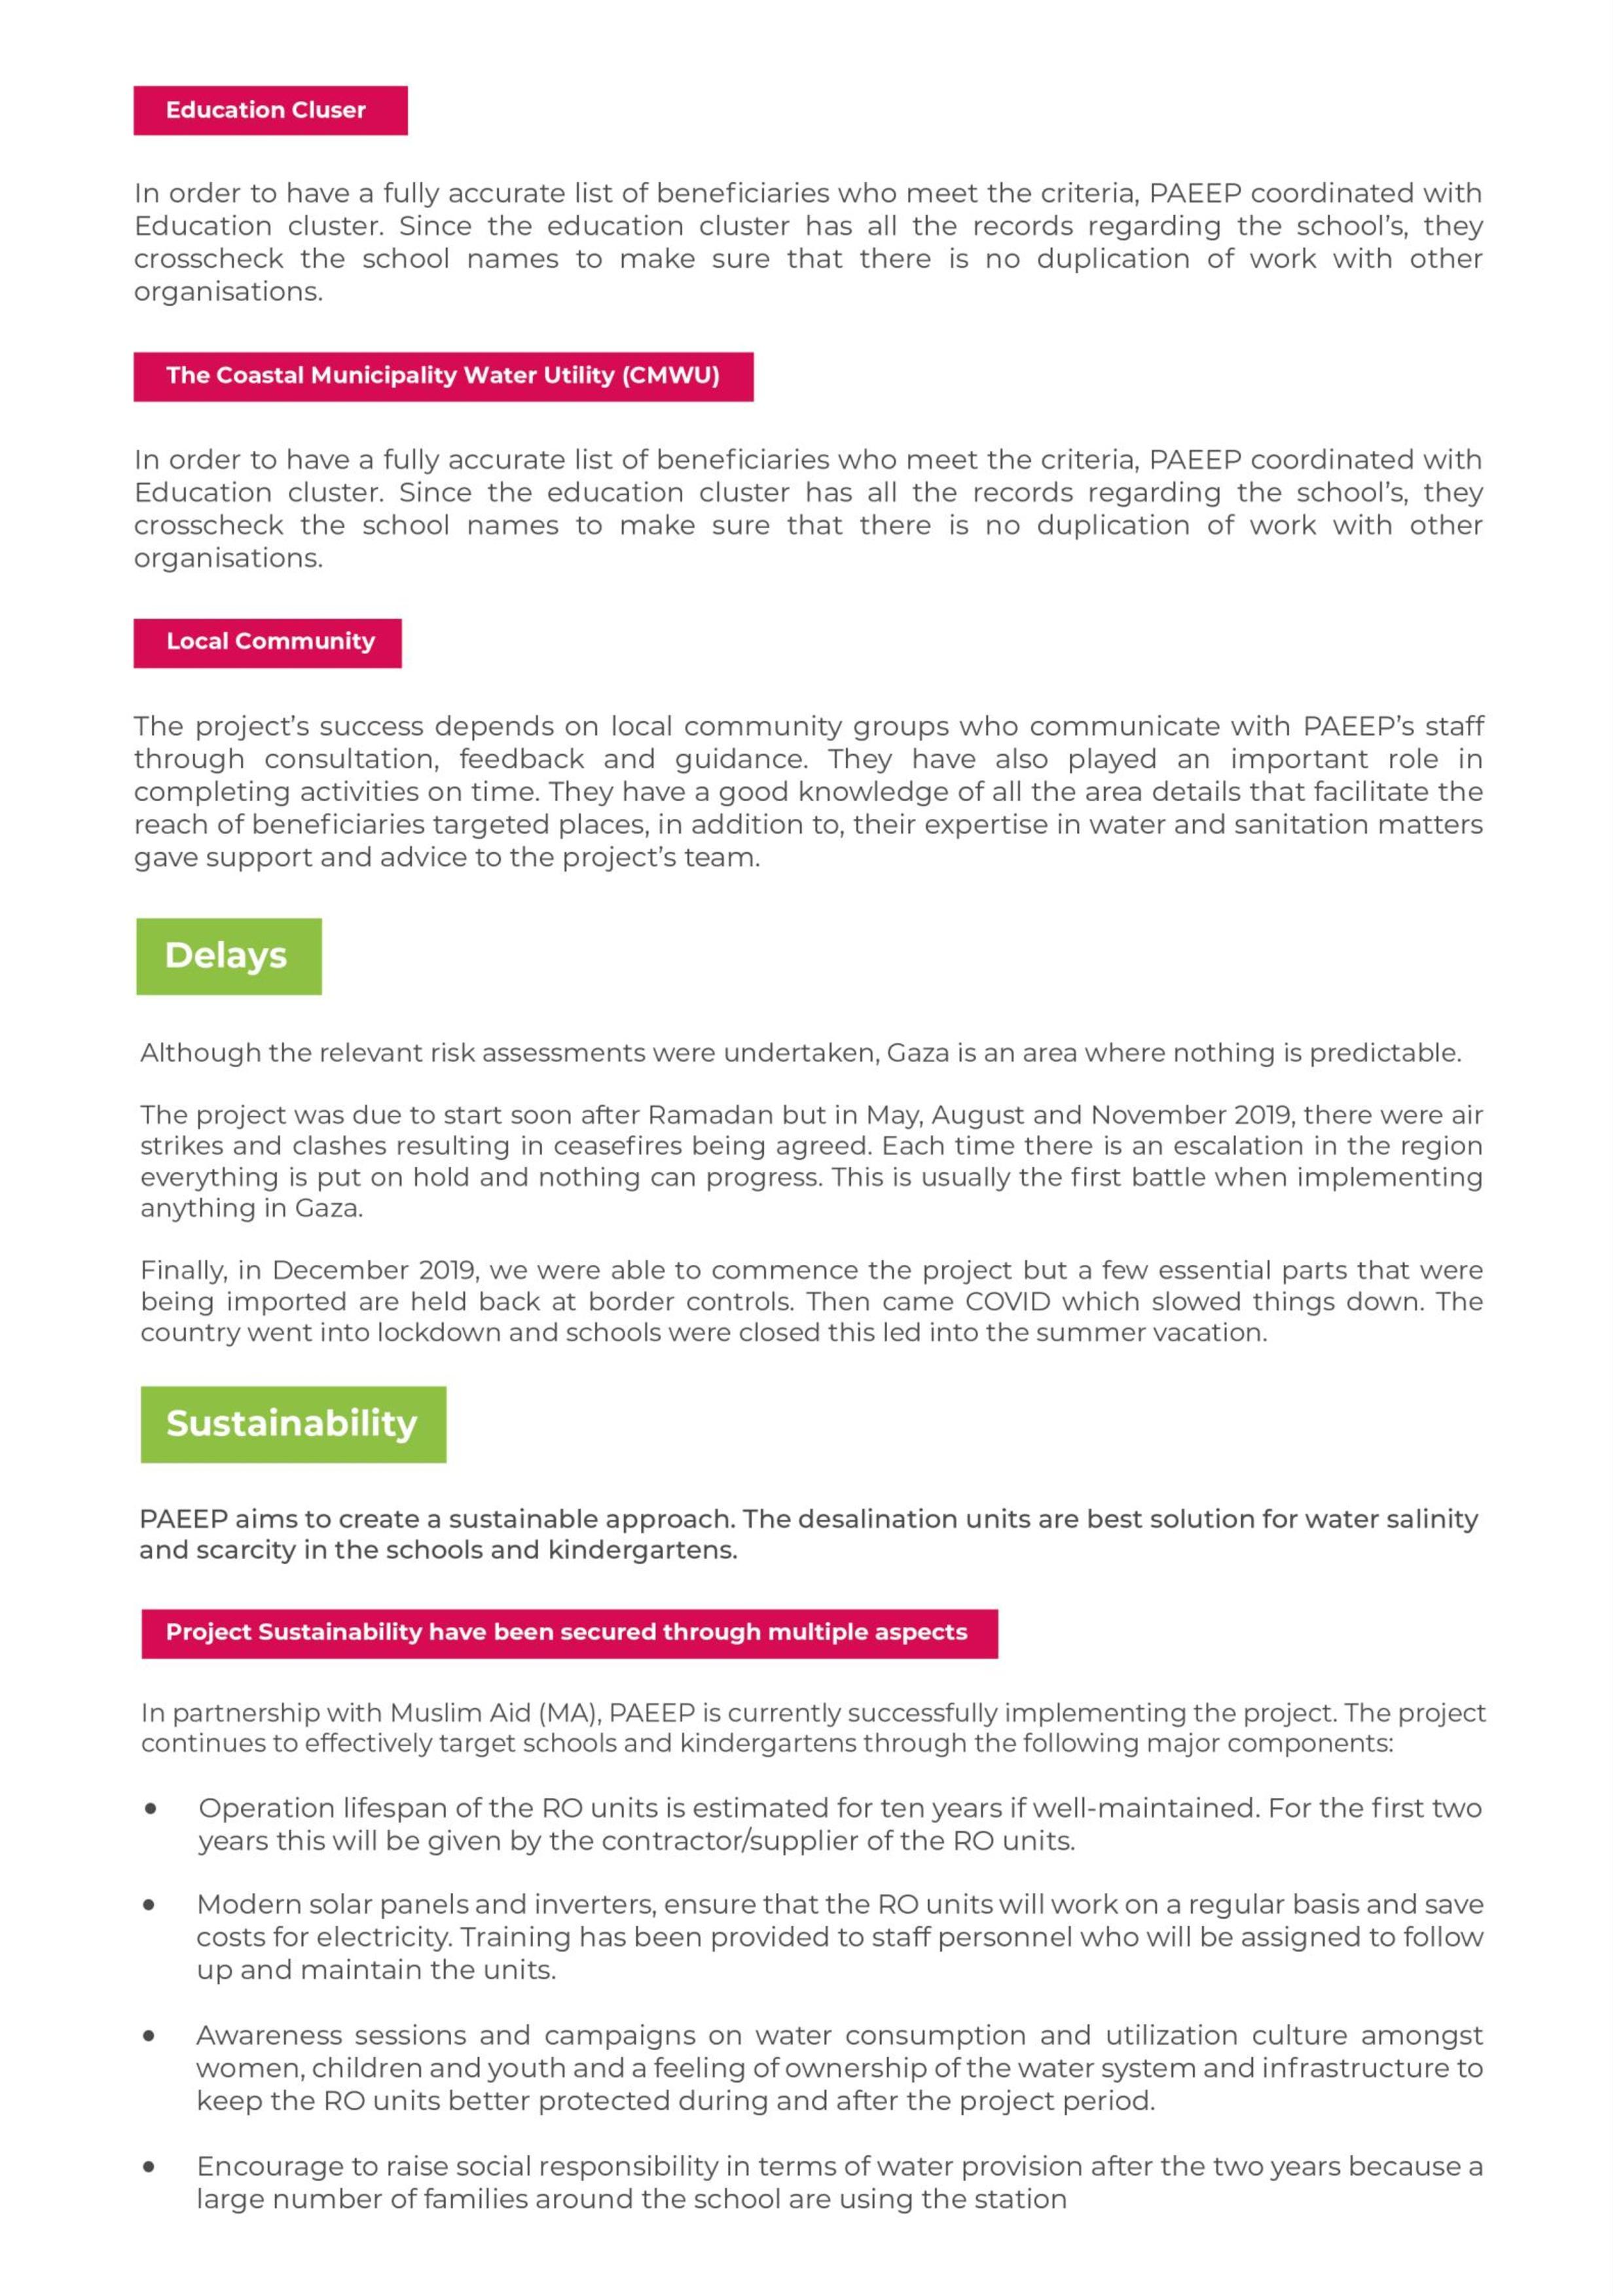 Gaza Water Report Details